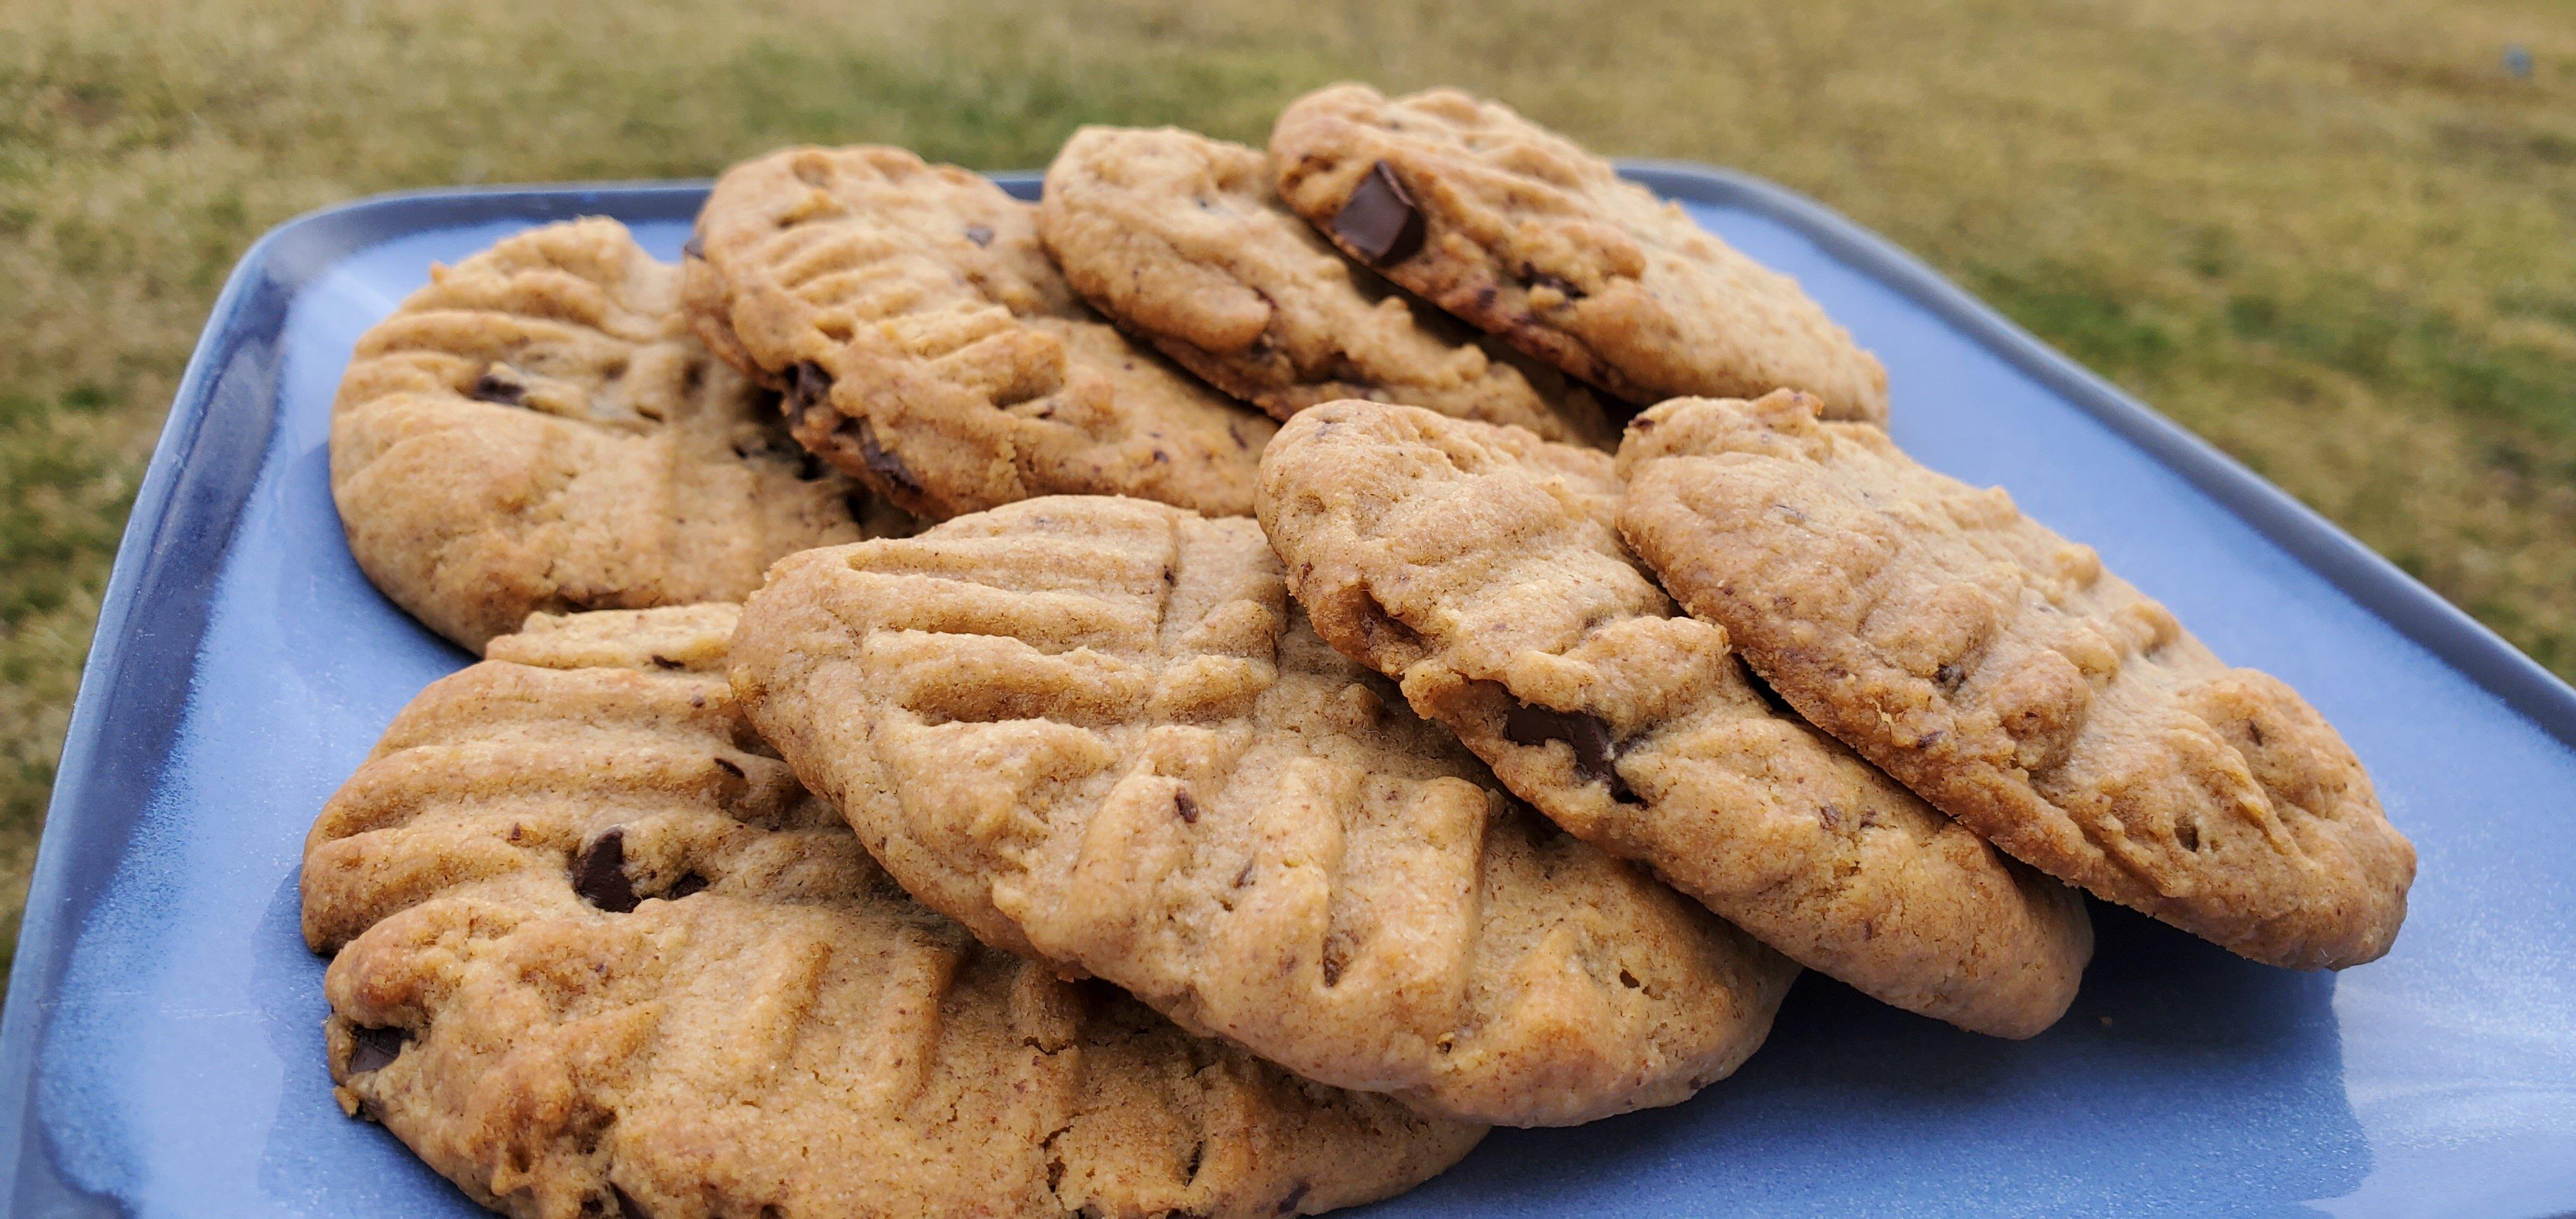 vegan chocolate almond butter cookies recipe